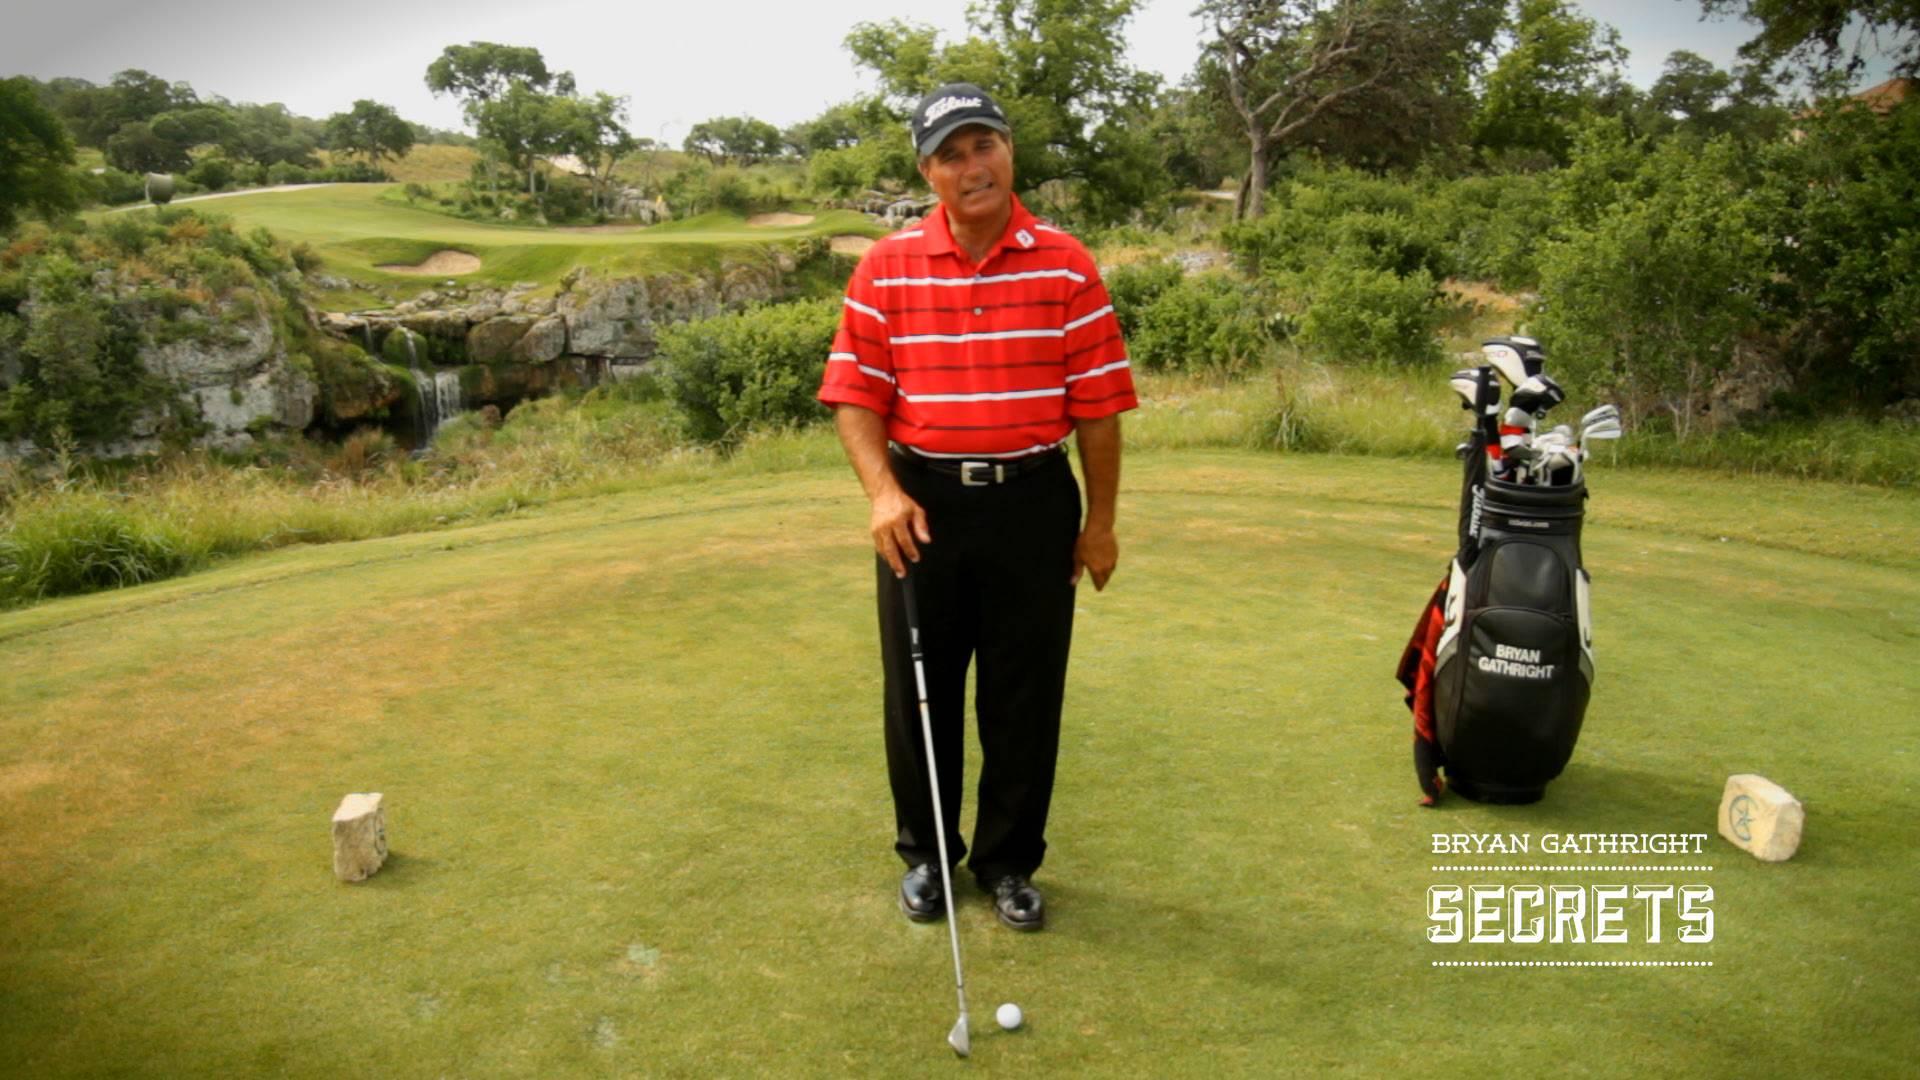 Harvey Penick Secret #3 - Correct Grip is Key to Great Golf